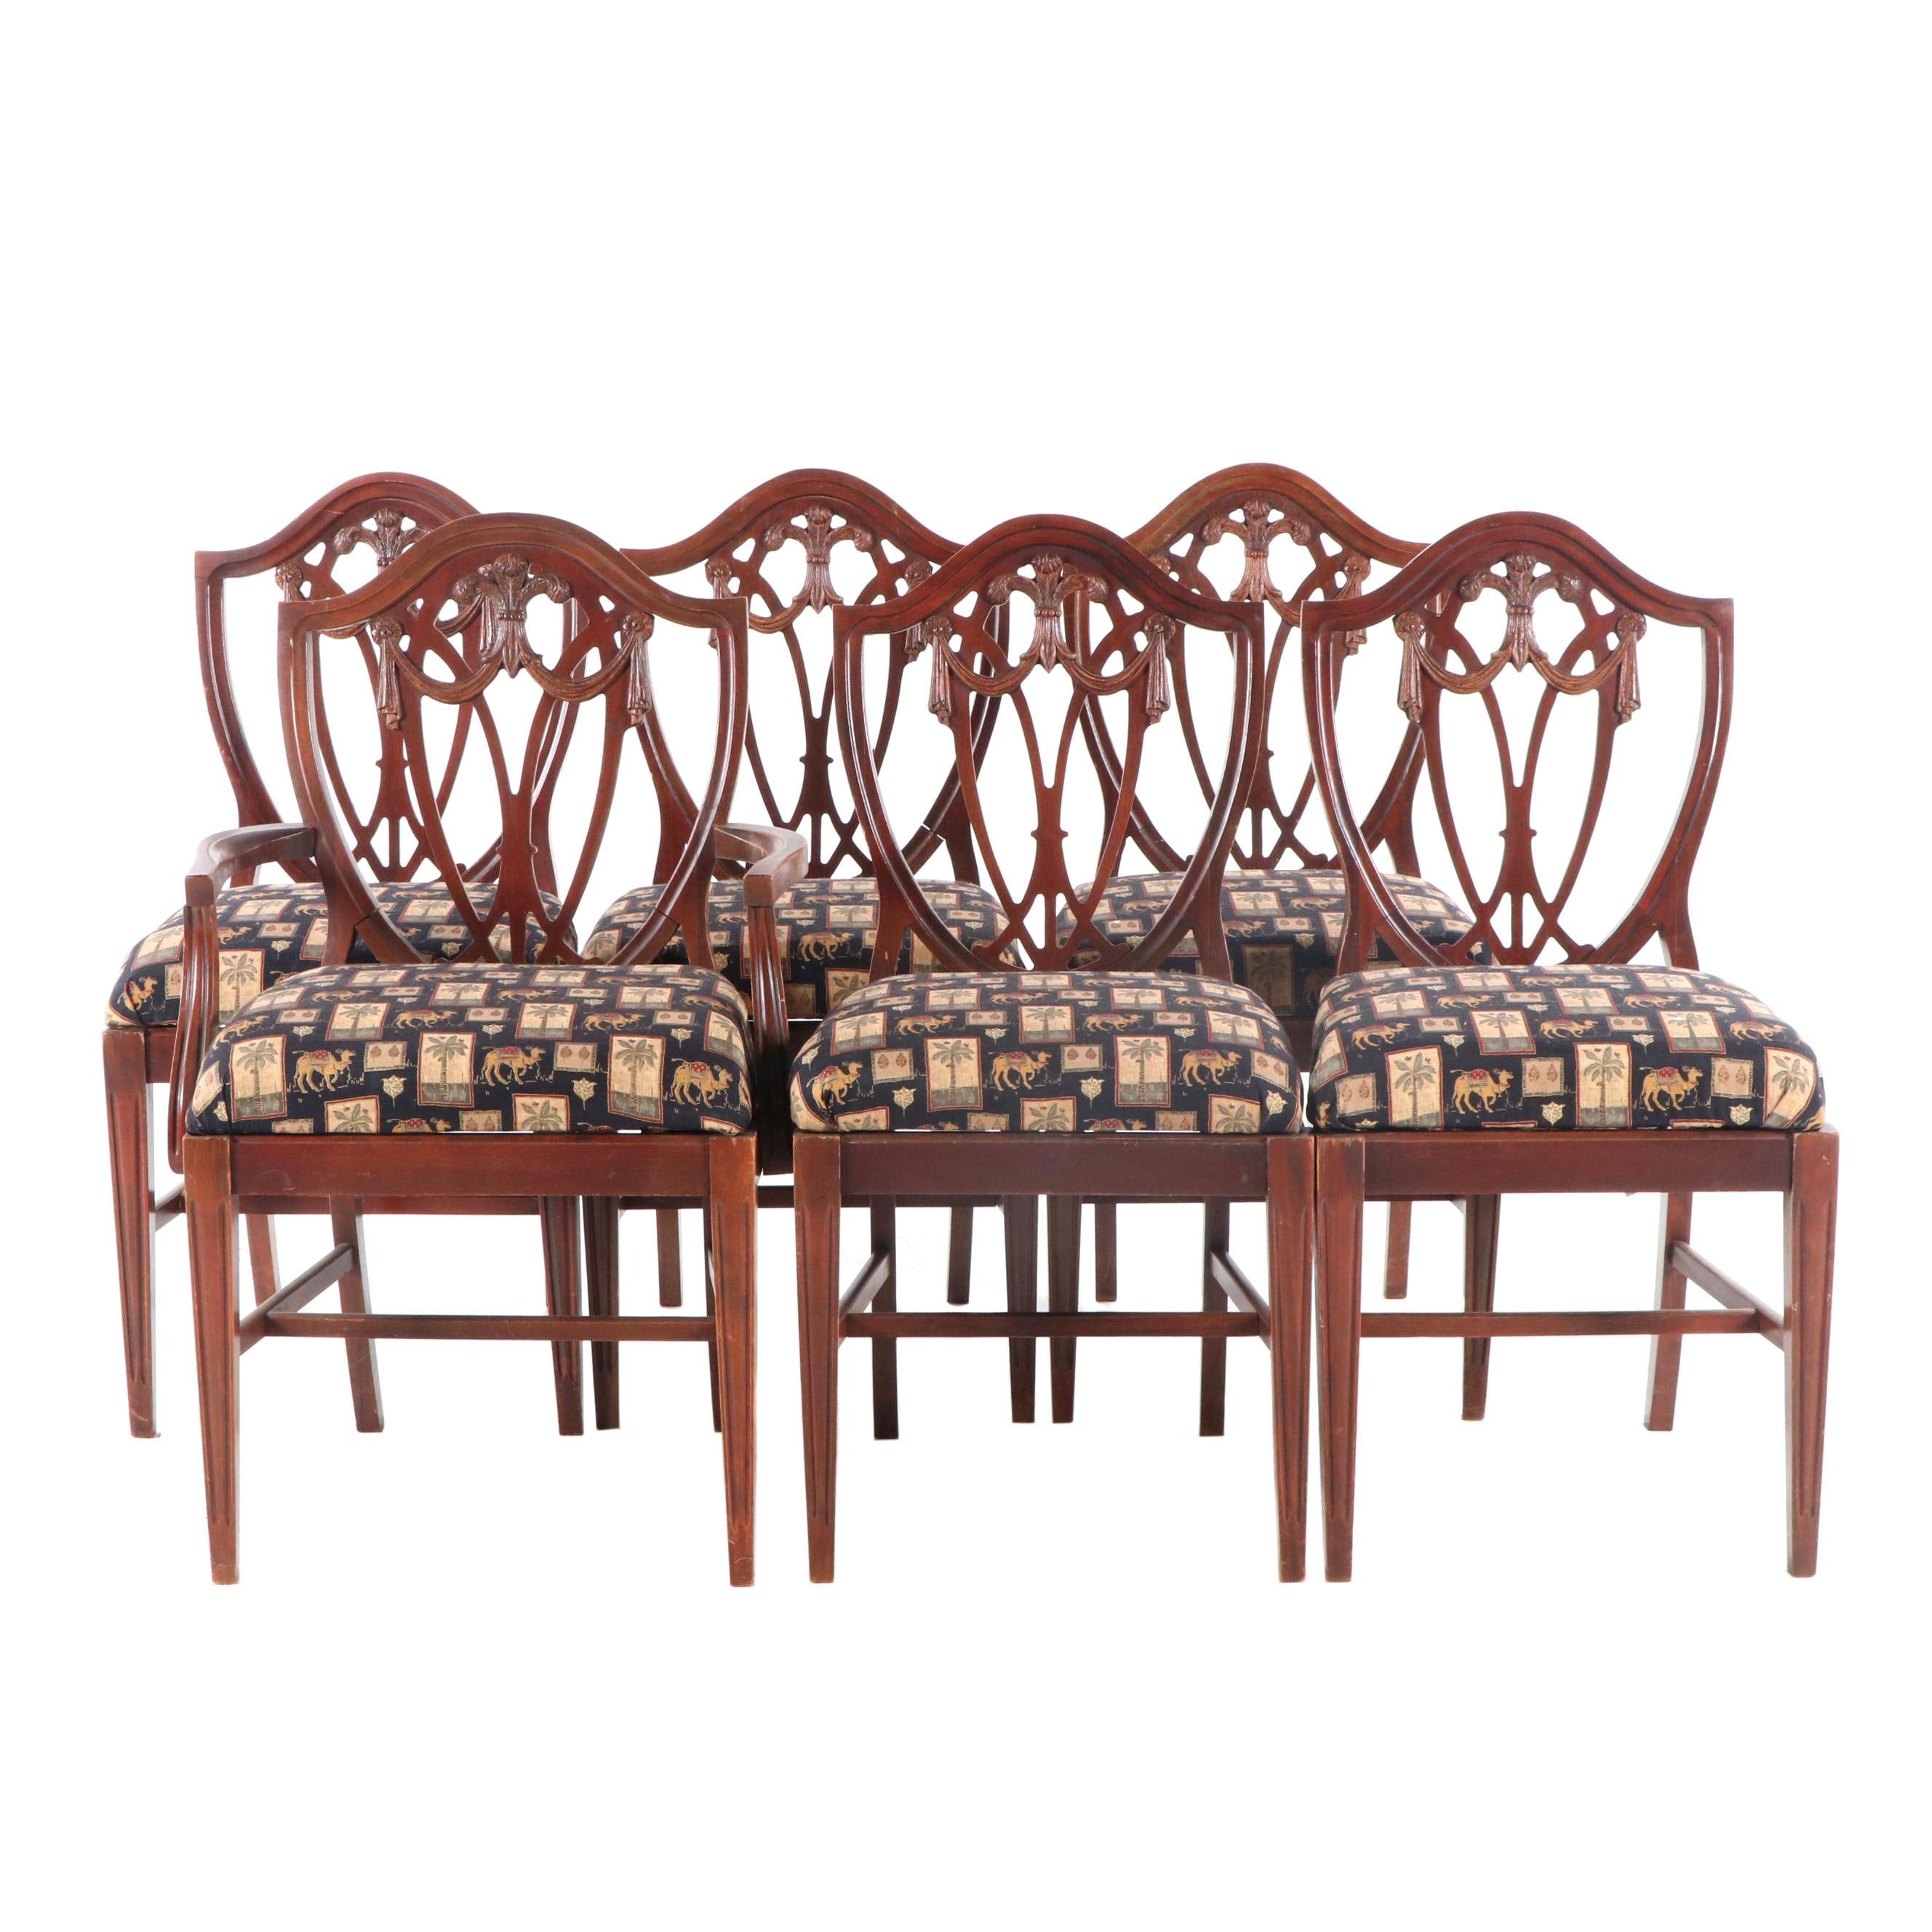 Hepplewhite Style Mahogany Dining Chairs, Mid 20th Century